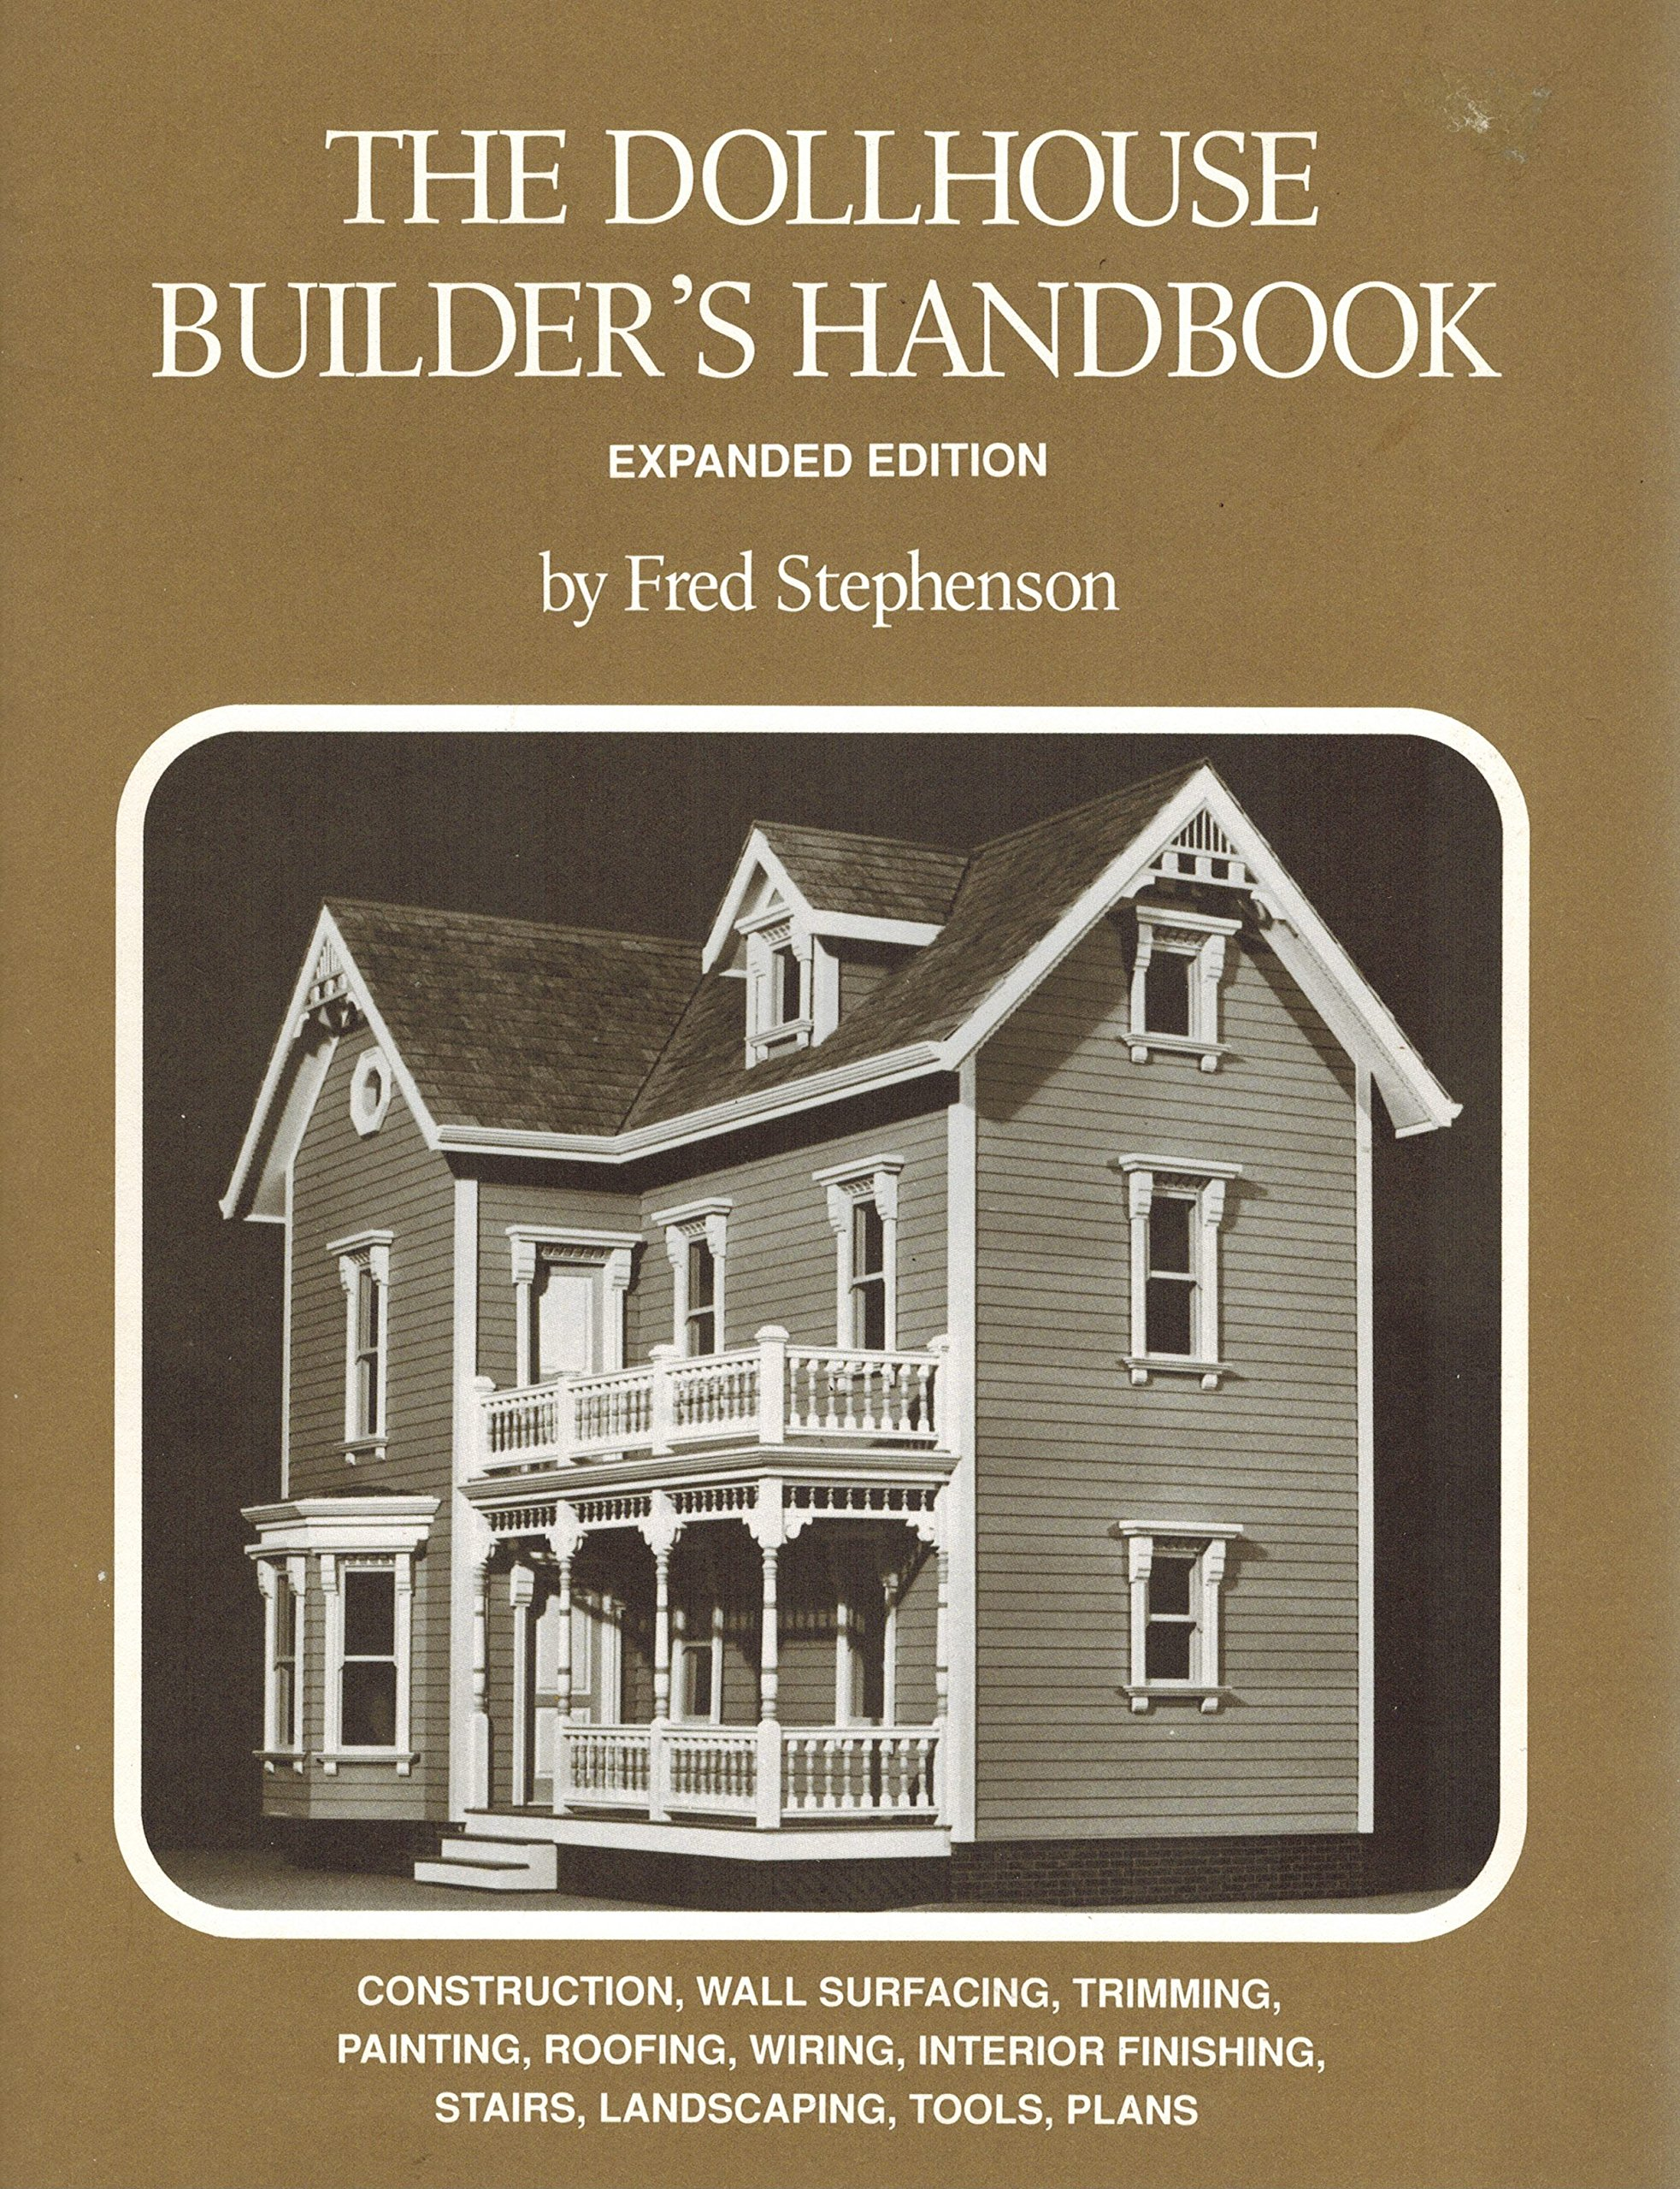 The Dollhouse Builders Handbook Fred Stephenson Books Doll House Wiring